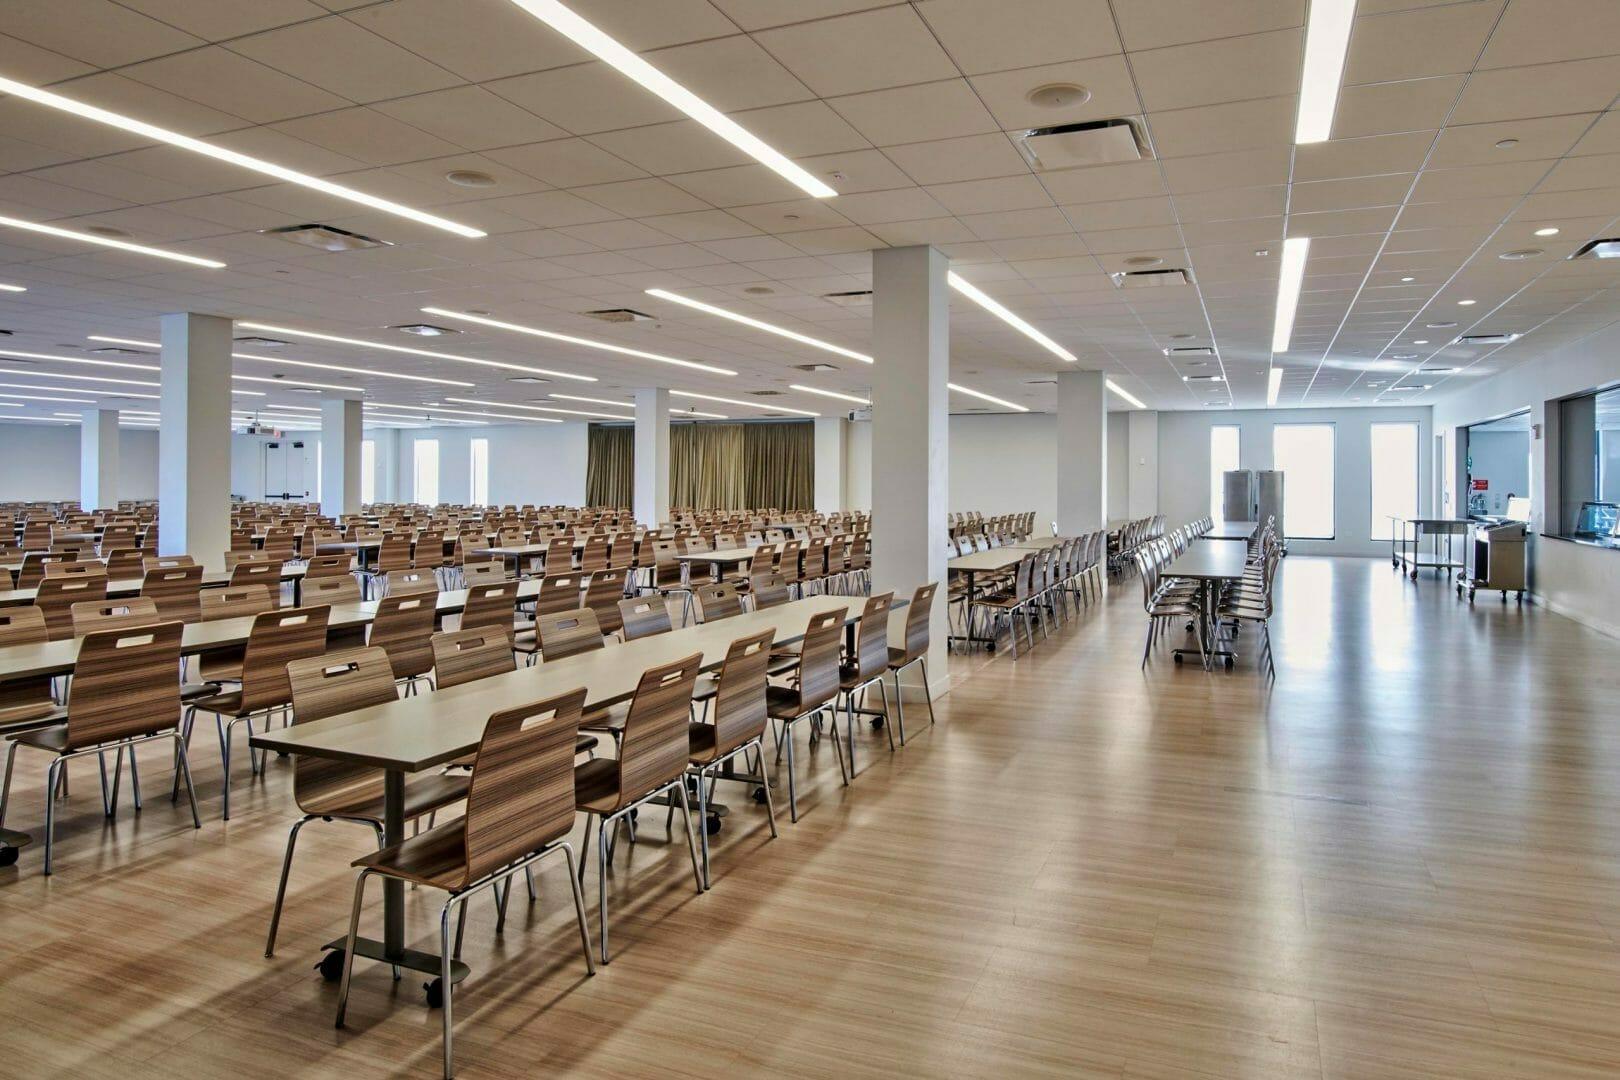 Center Dining Hall